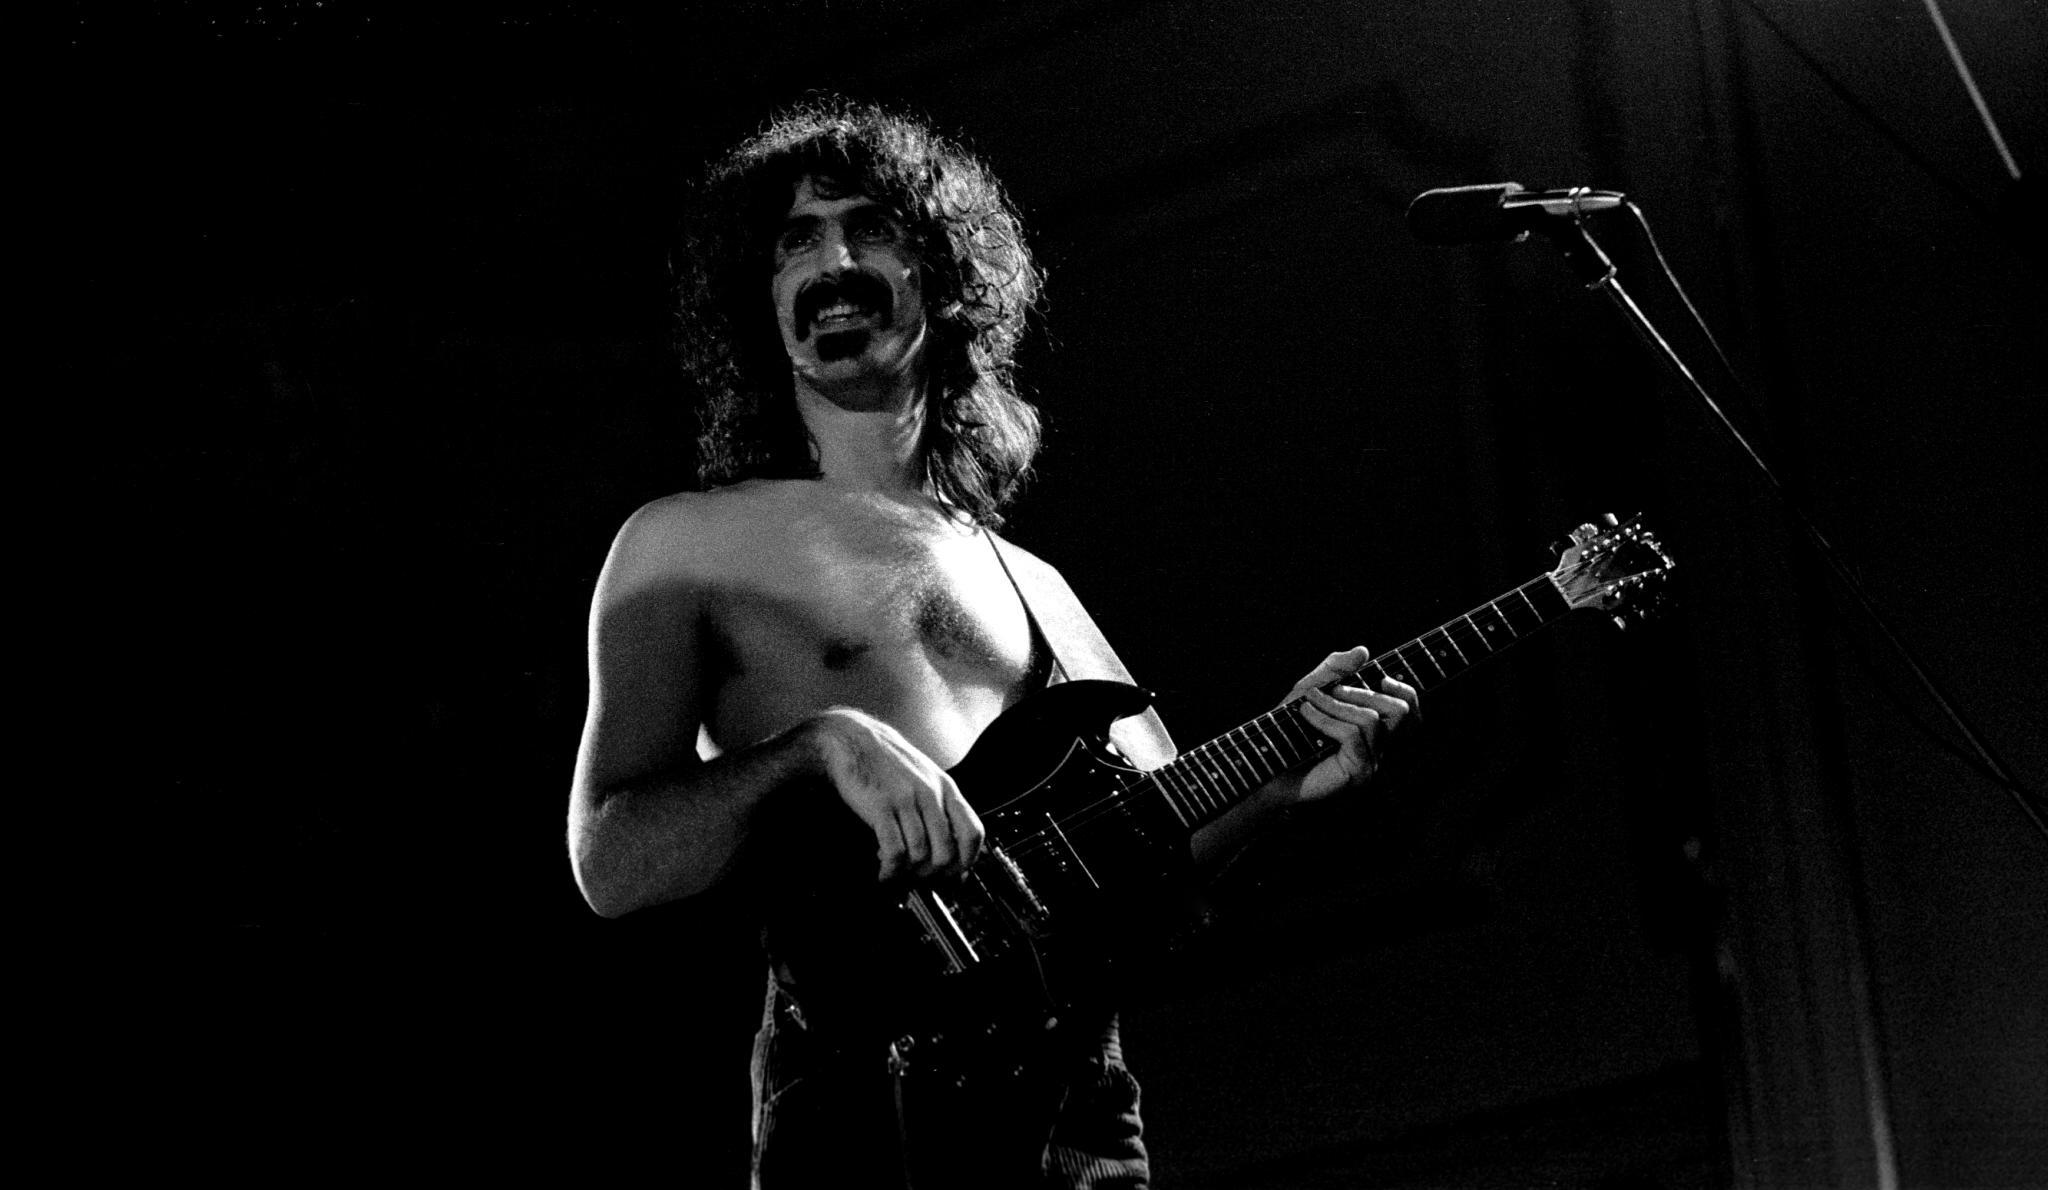 A Method in Exploring the Frank Zappa Album's Catalog